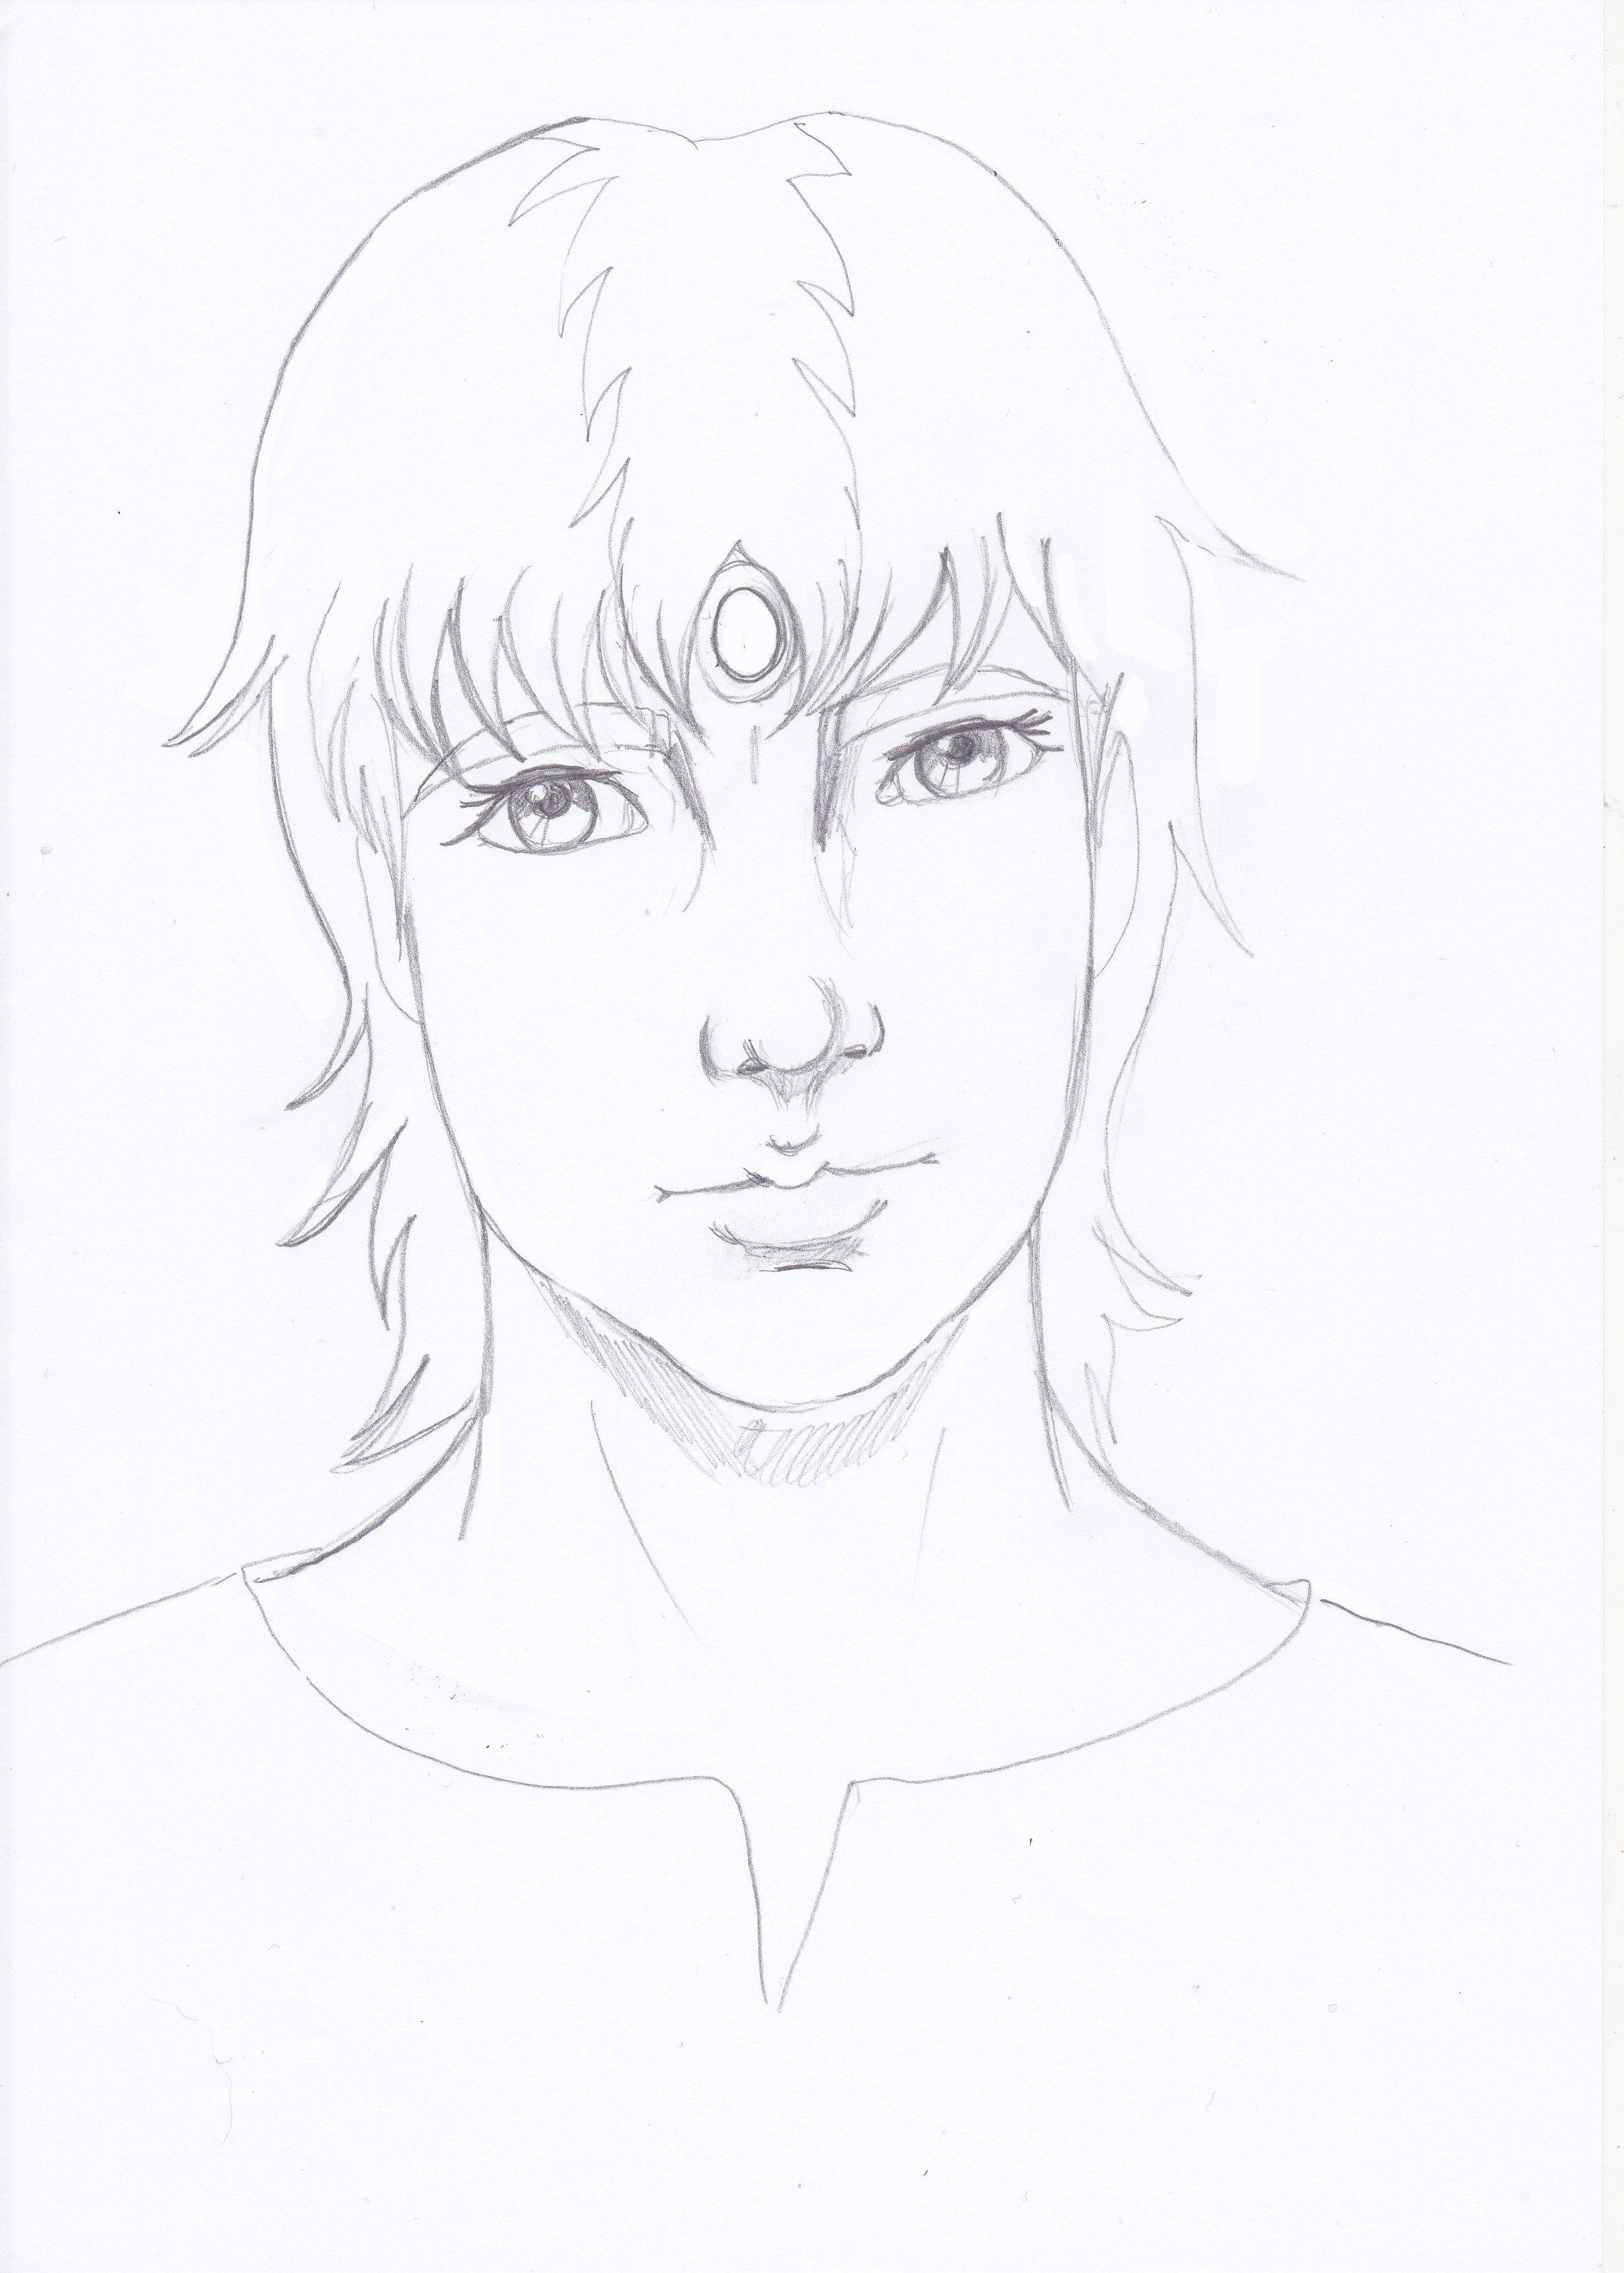 Dessin de manga facile fairy tail dessin de manga - Dessin de manga ...